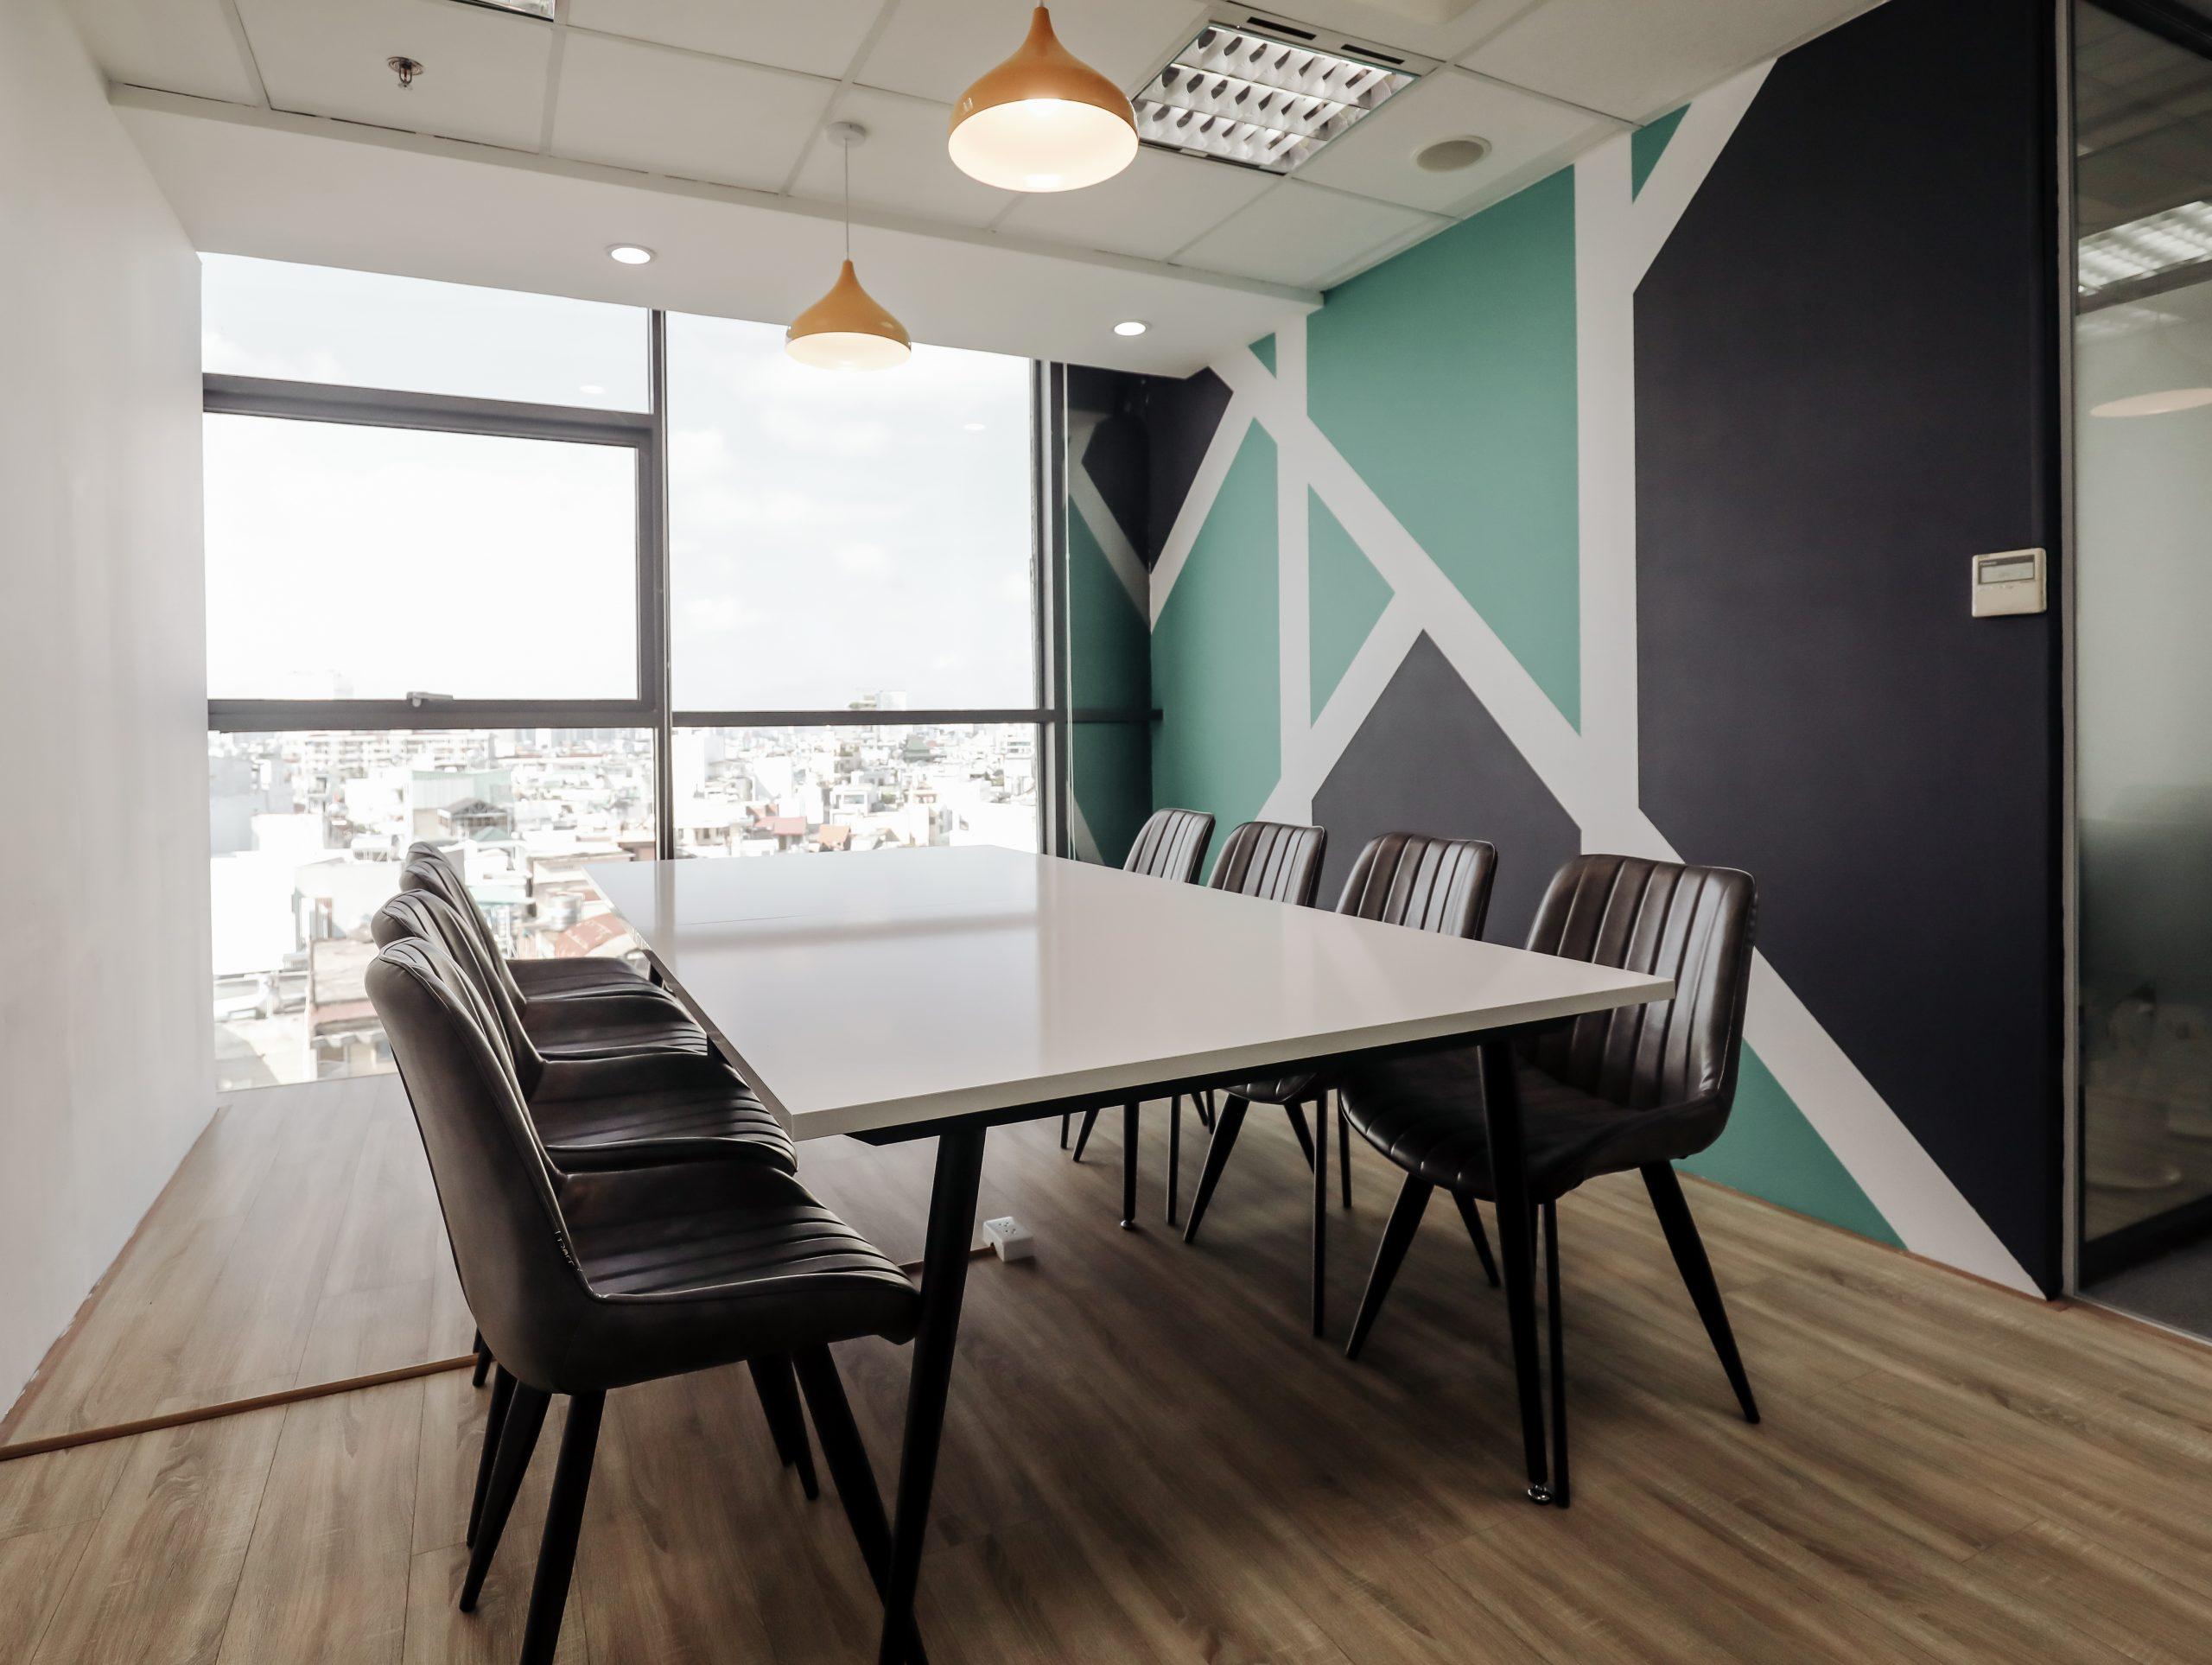 HCMC meeting room blog